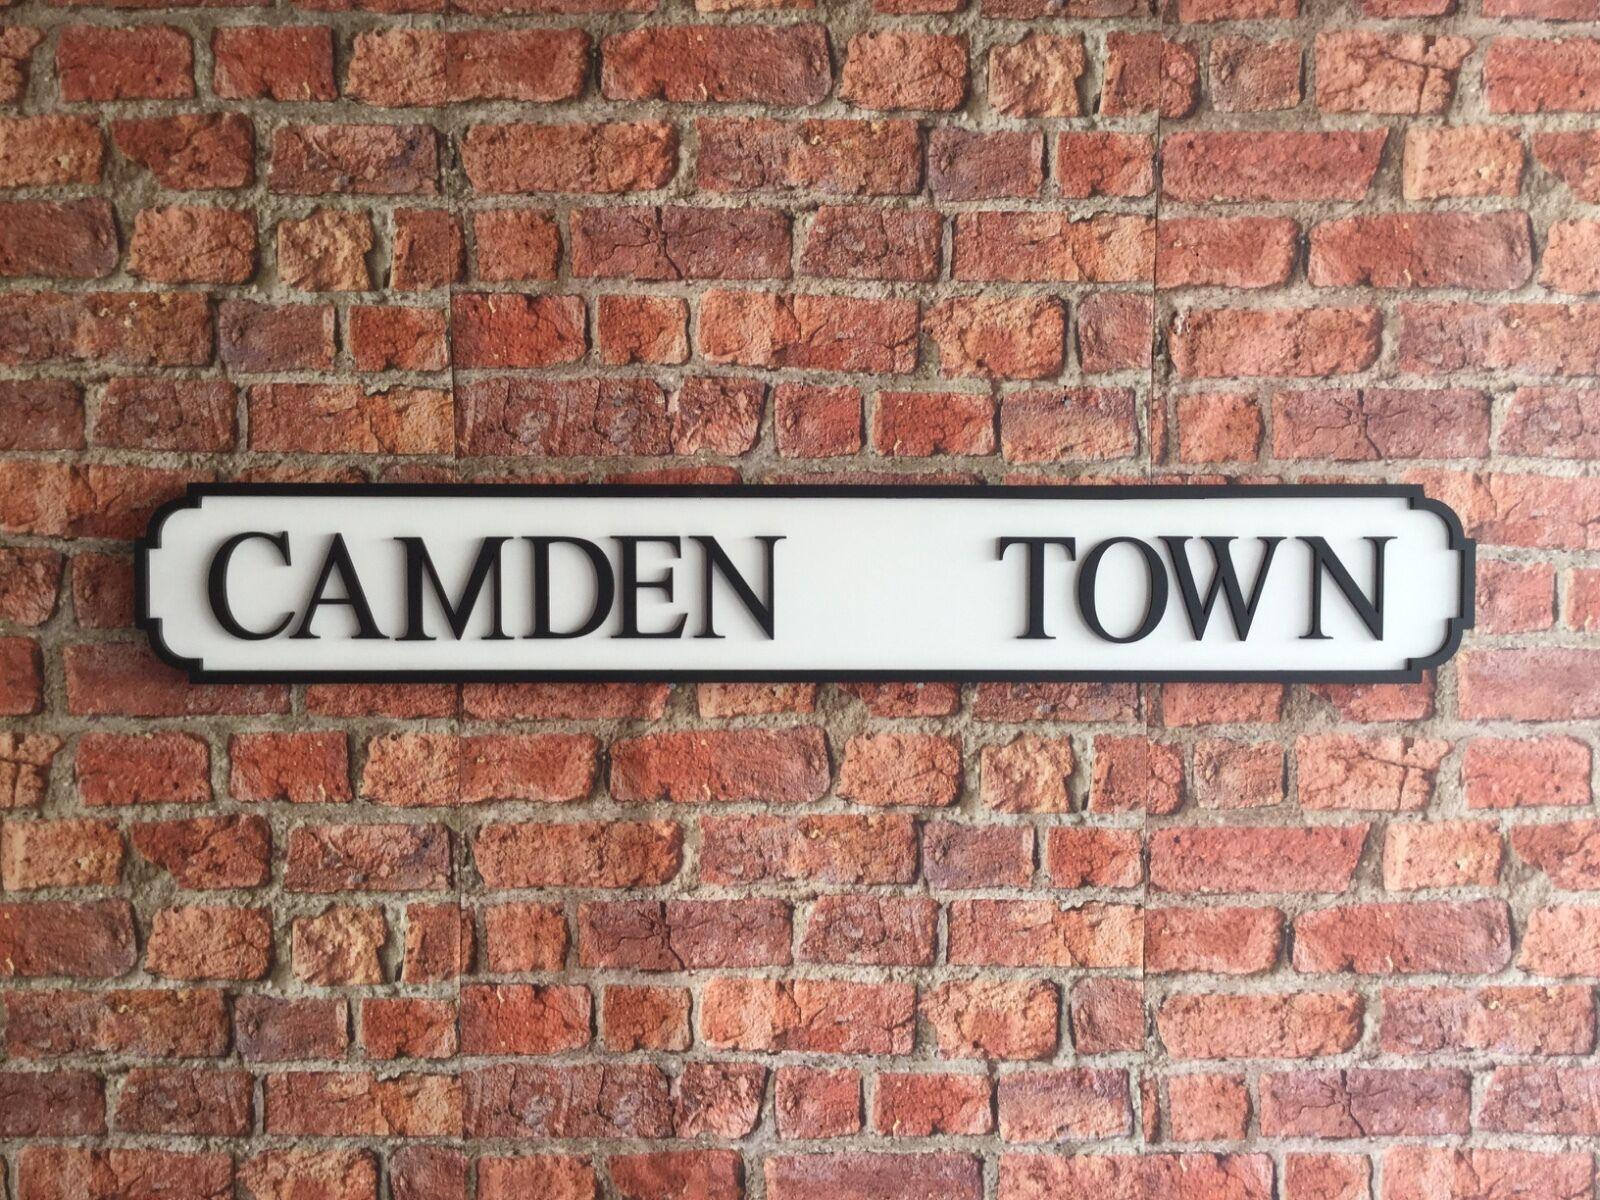 Camden Town Vintage Wood Street Cartello Stradale